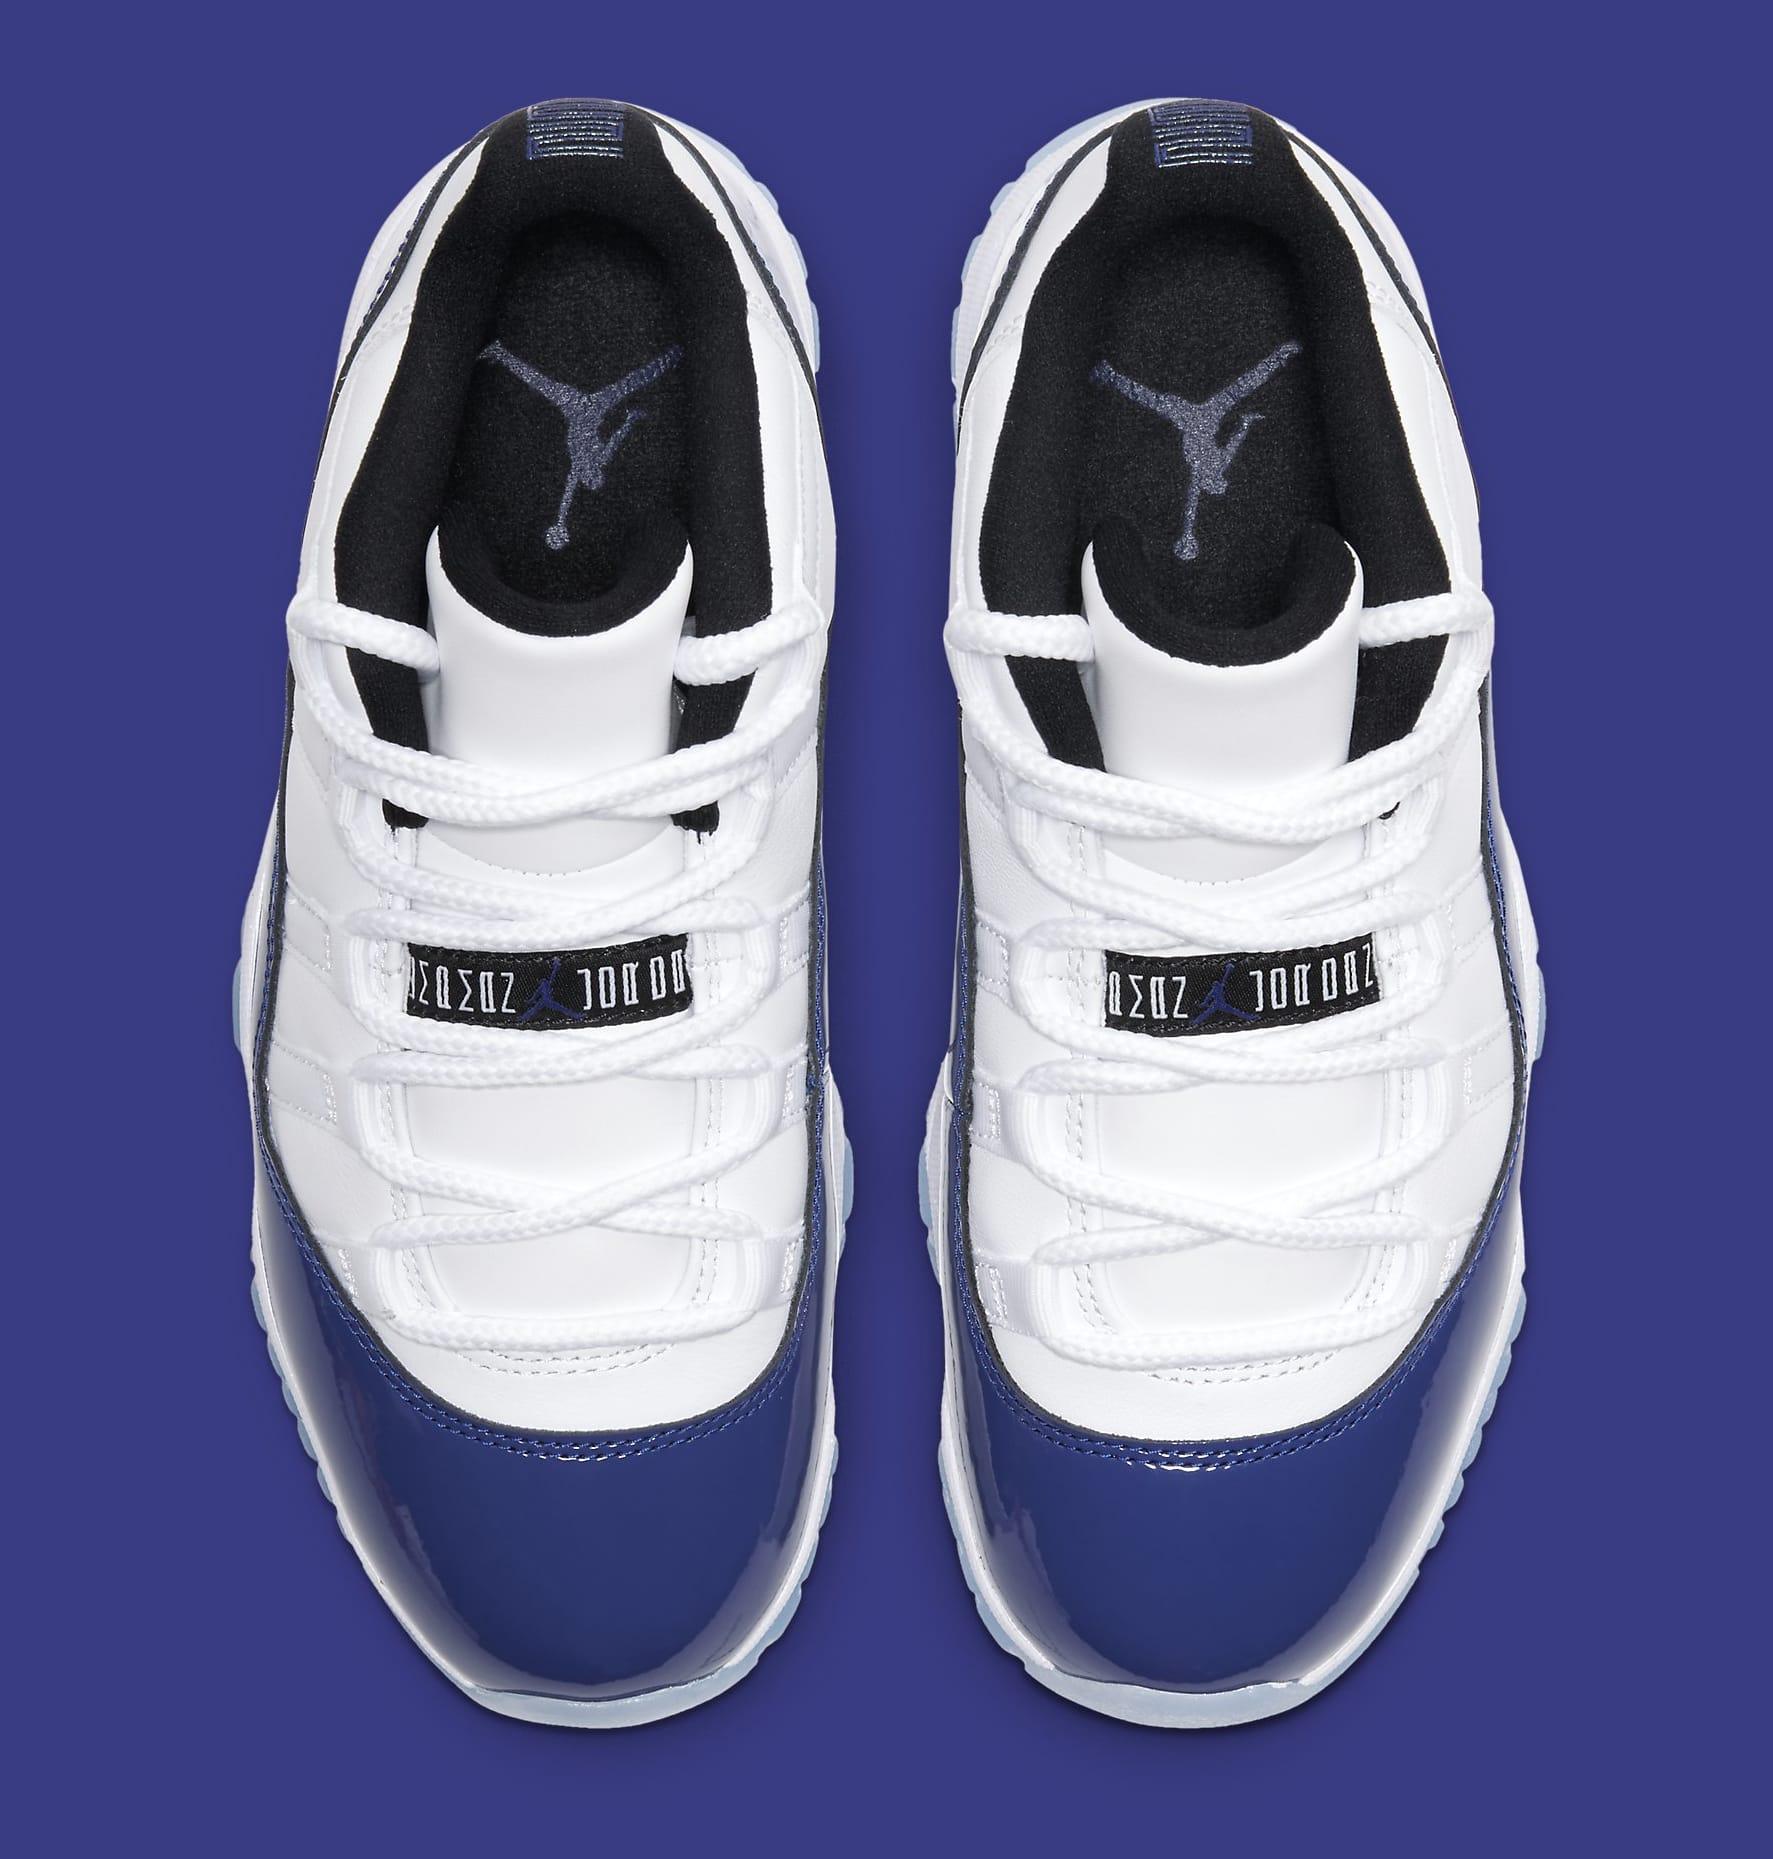 Air Jordan 11 Retro Low Wmns White Black Concord Release Date